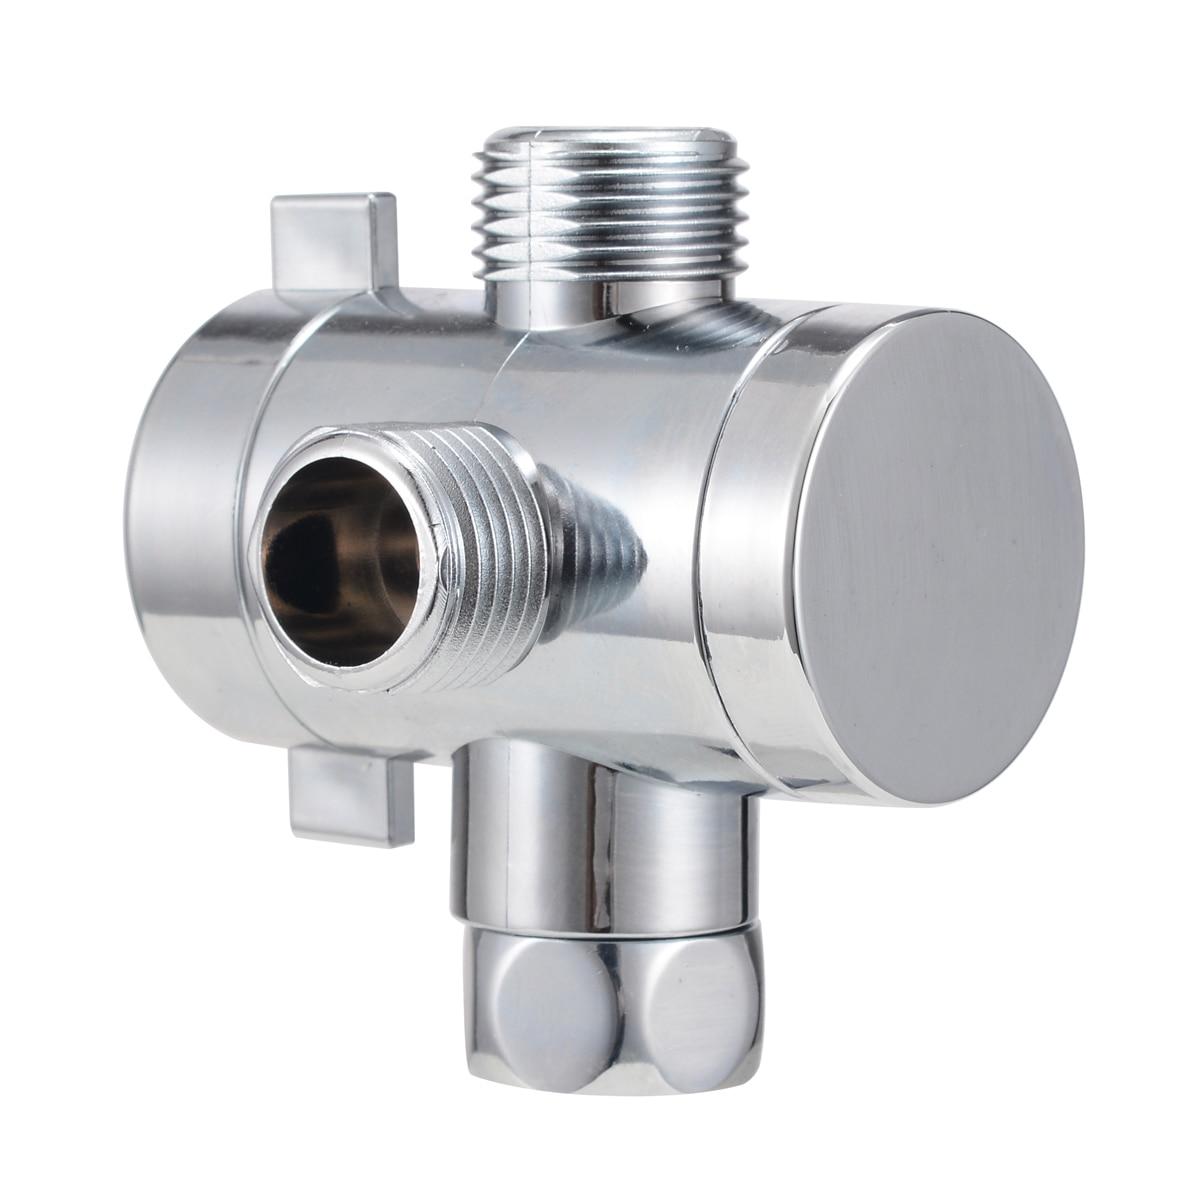 1pc 1 2inch 3 Way T adapter Diverter Bath Arm Mounted Connector Diverter Bath Adjustable Shower Diverter Valve Bathroom Part in Shower Heads from Home Improvement